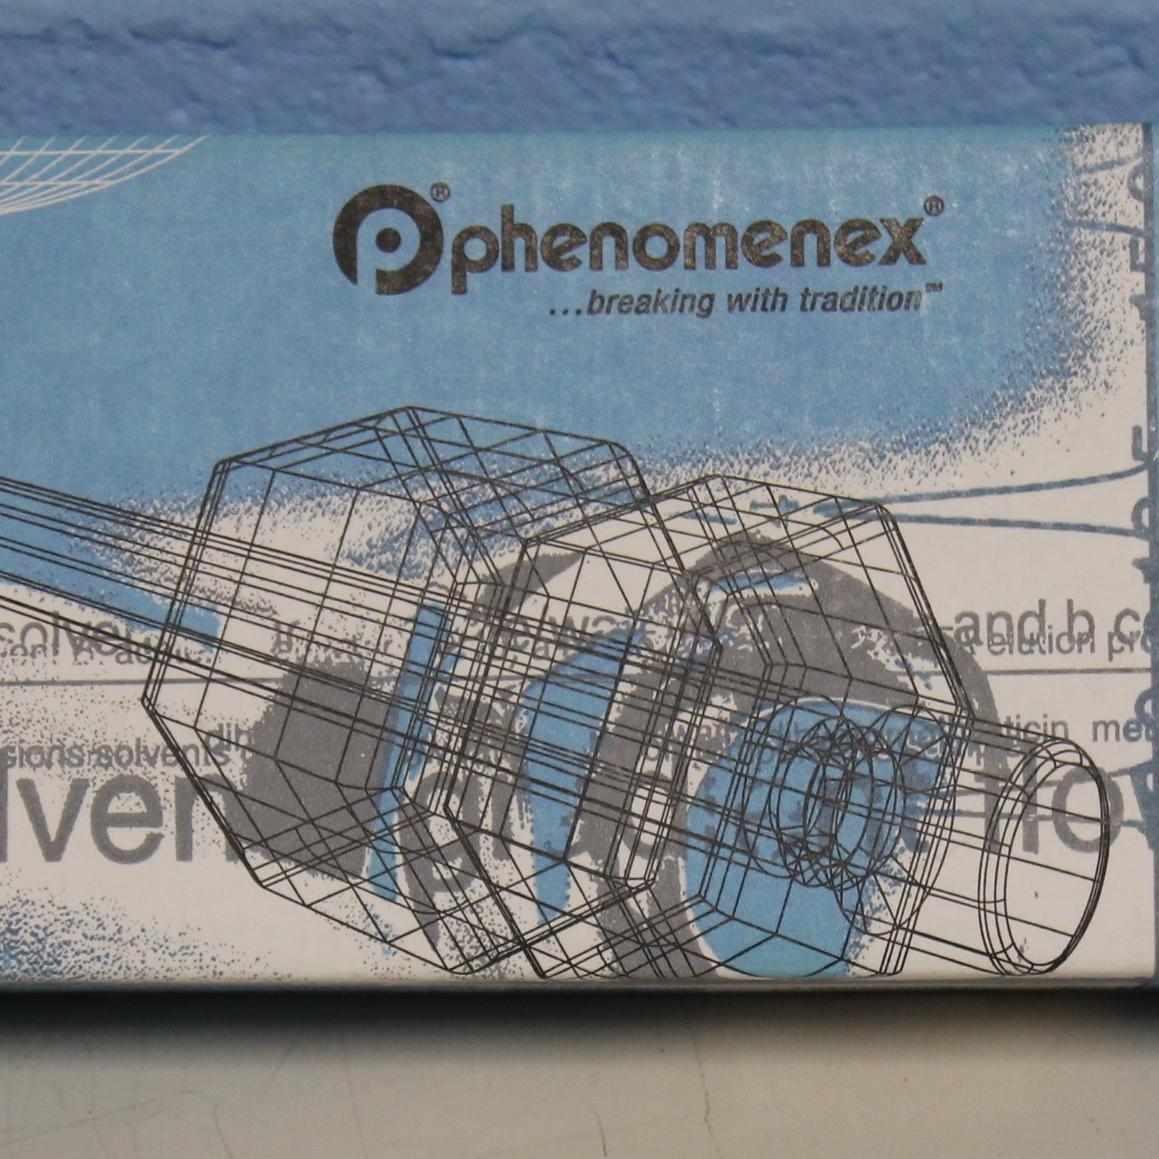 Phenomenex Synergi 4 m Hydro-RP 80 , LC Column 50 x 2 mm P/N 00B-4375-B0 Image